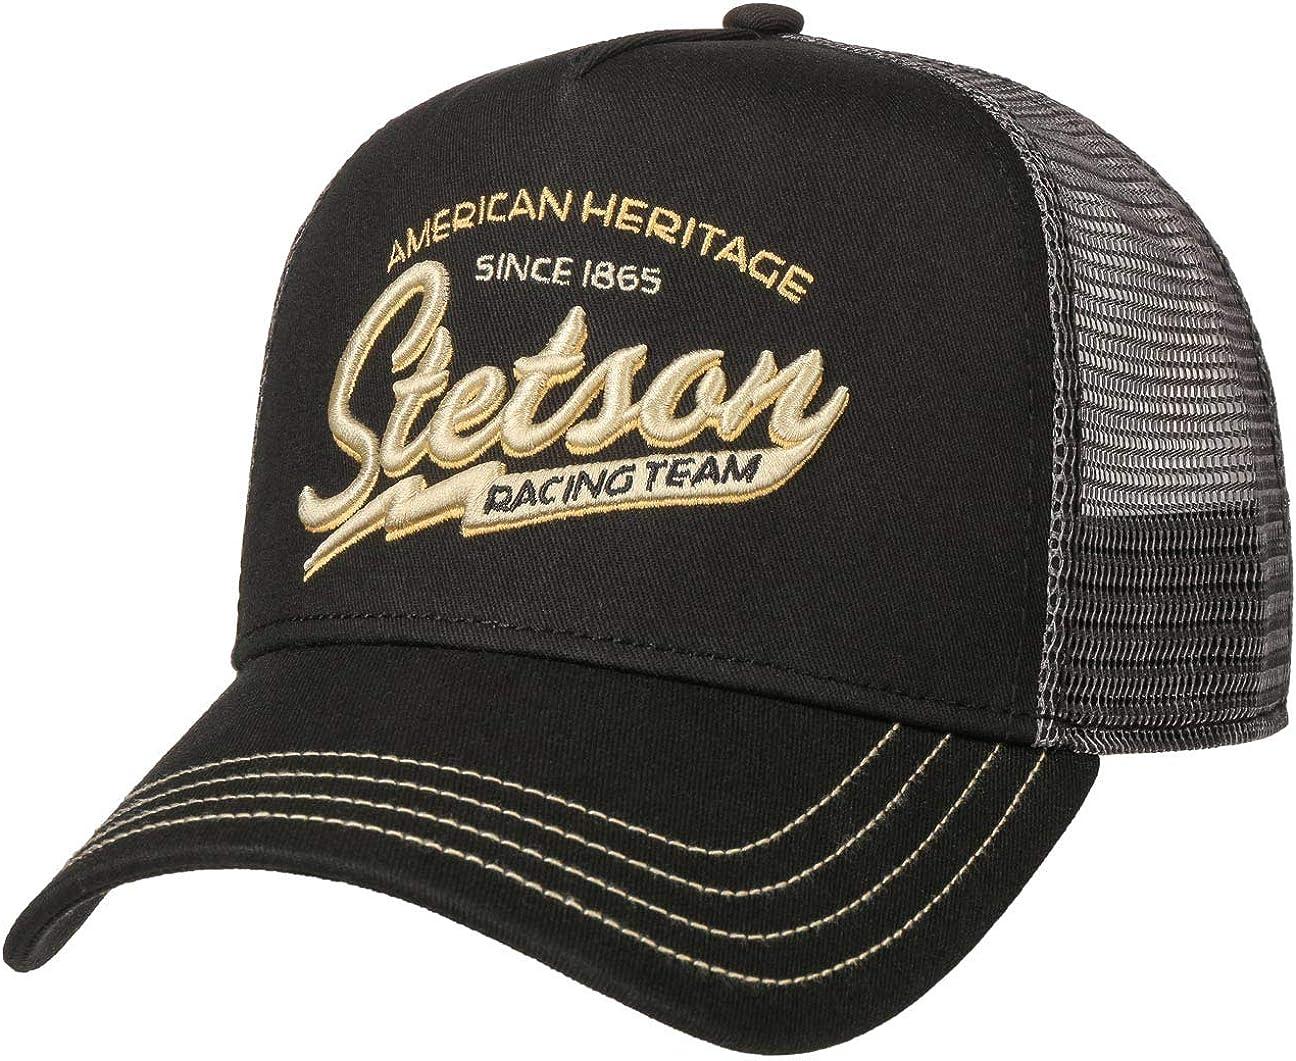 Visiere Printemps-ete avec Visiere Baseball Cap Mesh de Snapback Stetson Casquette Trucker Racing Team Homme